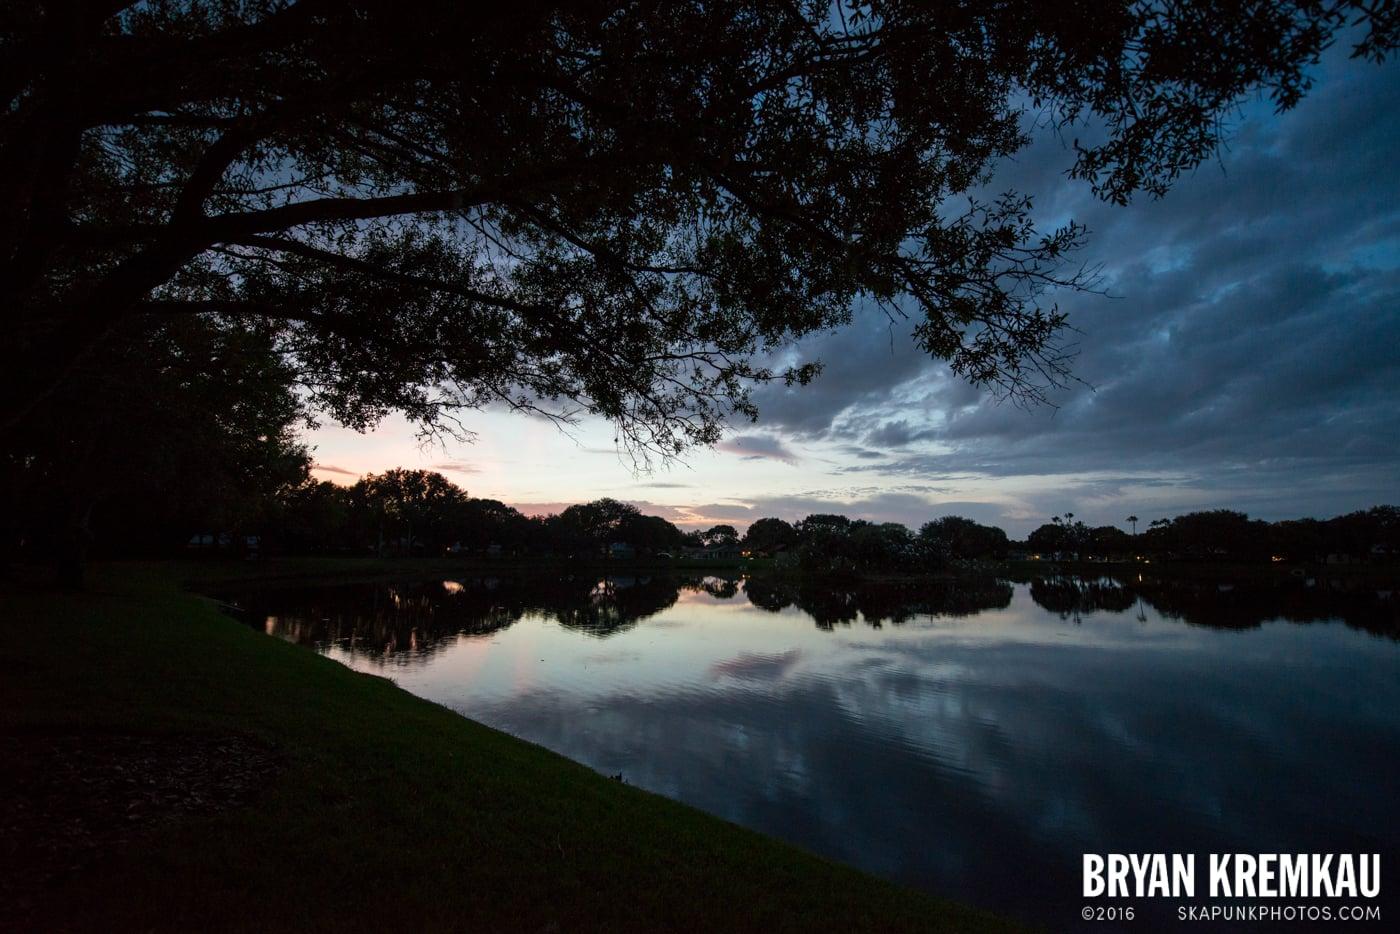 Sunsets, Astrophotography & Birds @ Venice, Florida - 10.25.14 - 11.5.14 (4)